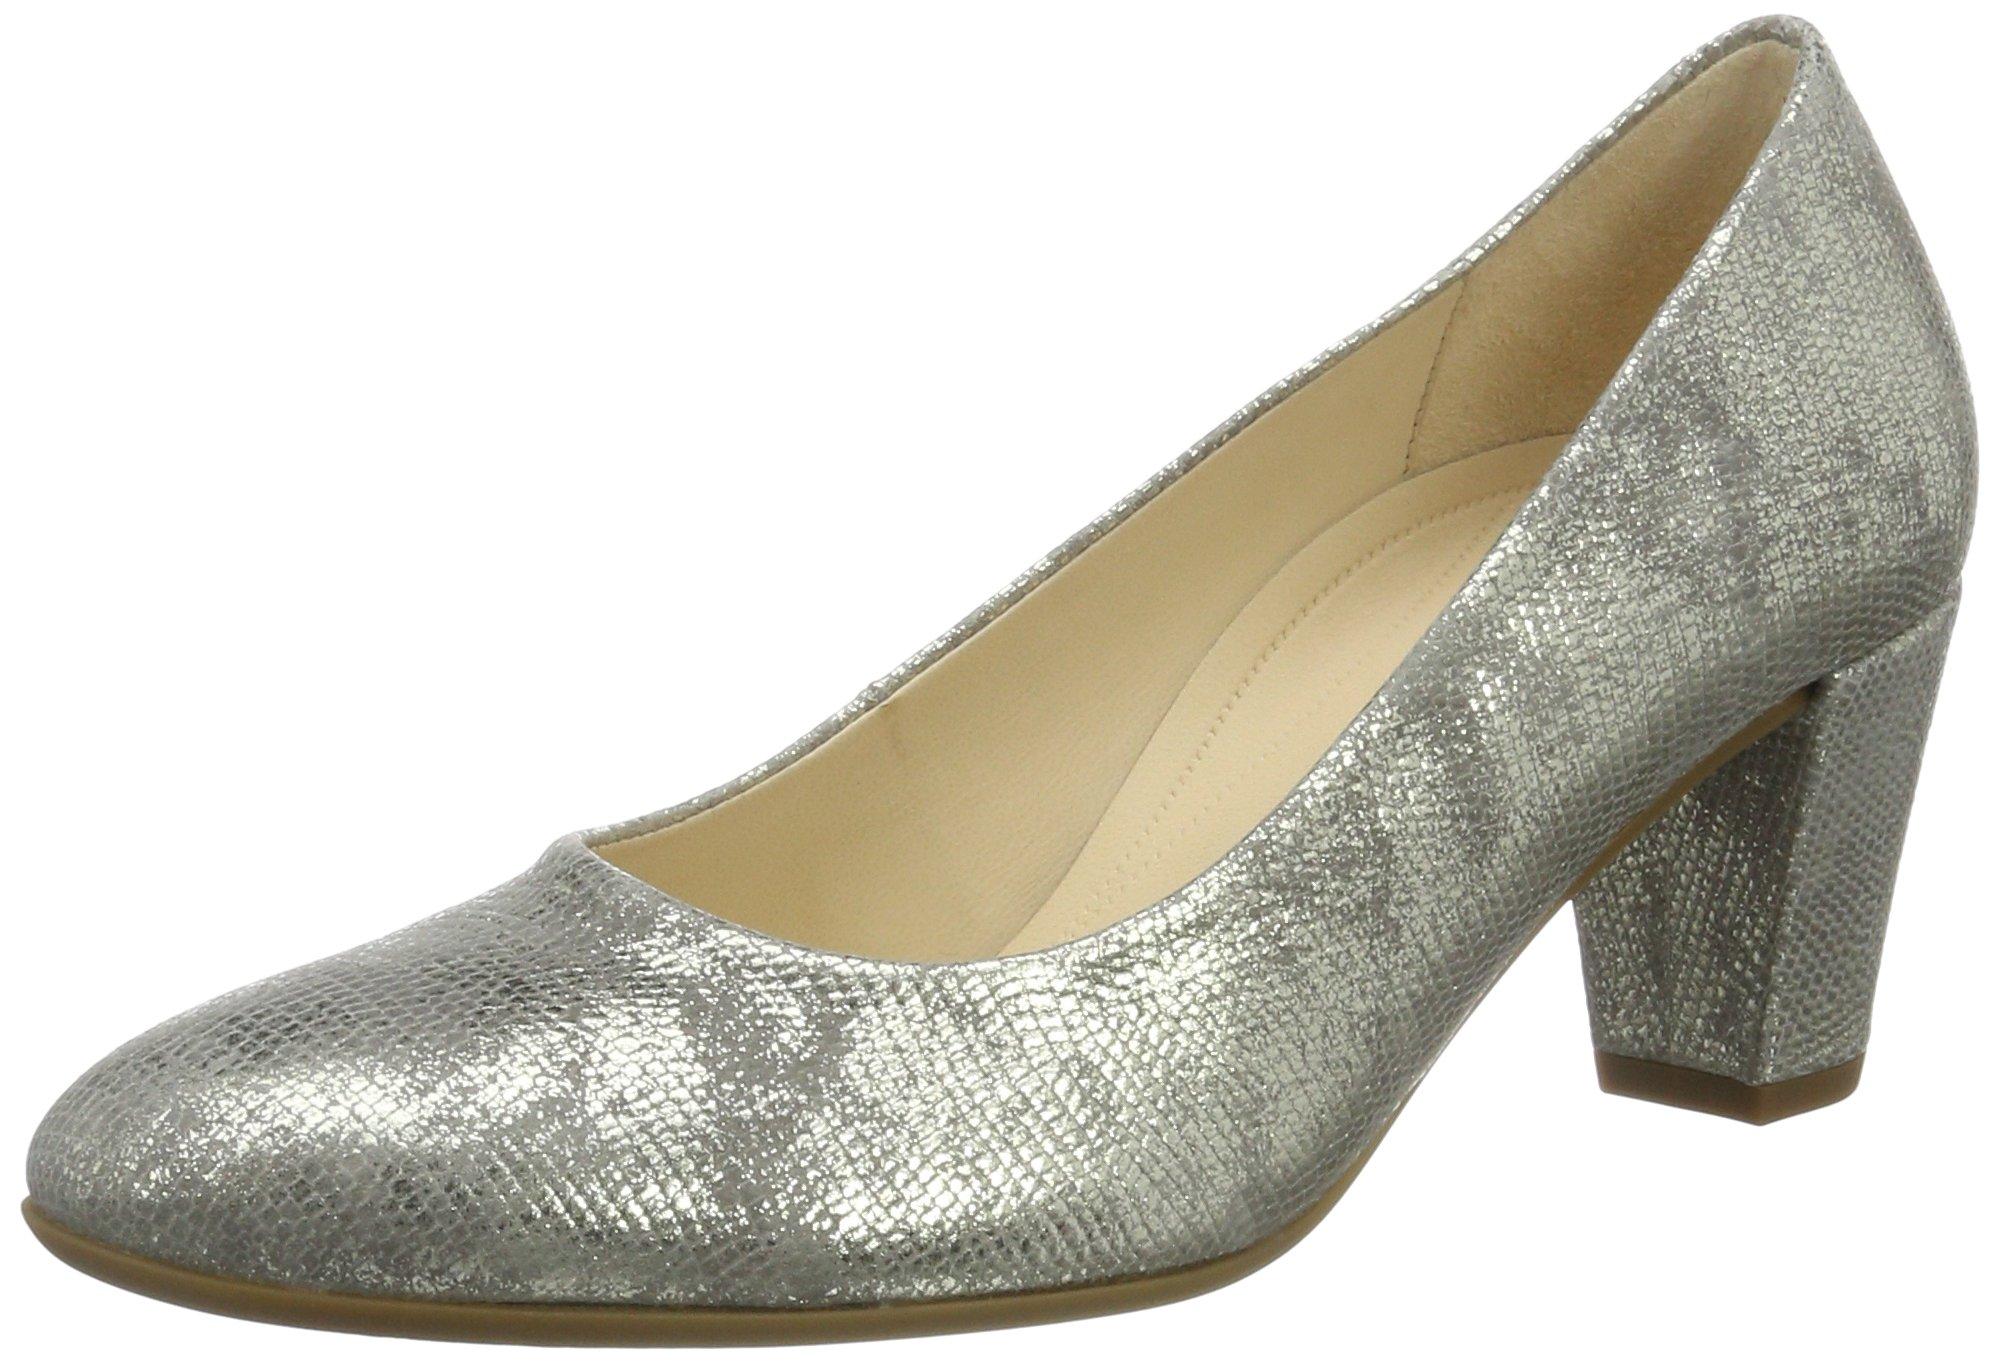 ComfortEscarpins Gabor 3038 Eu FemmeGrisargento Shoes 9IDHWEY2